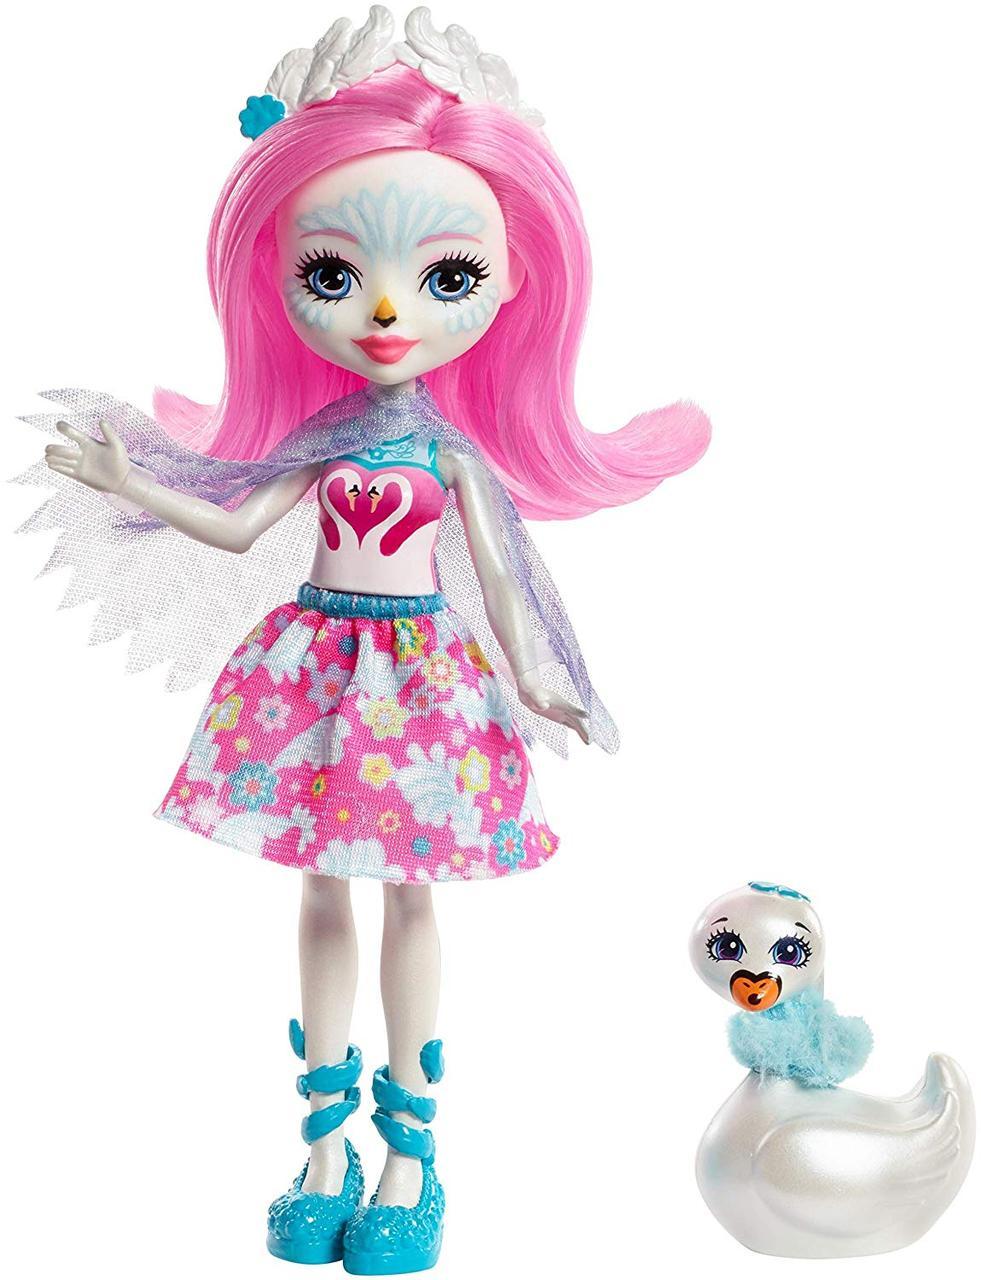 Enchantimals Лебедь Саффи и друг Пойз Enchantimals Saffi Swan Doll & Poise